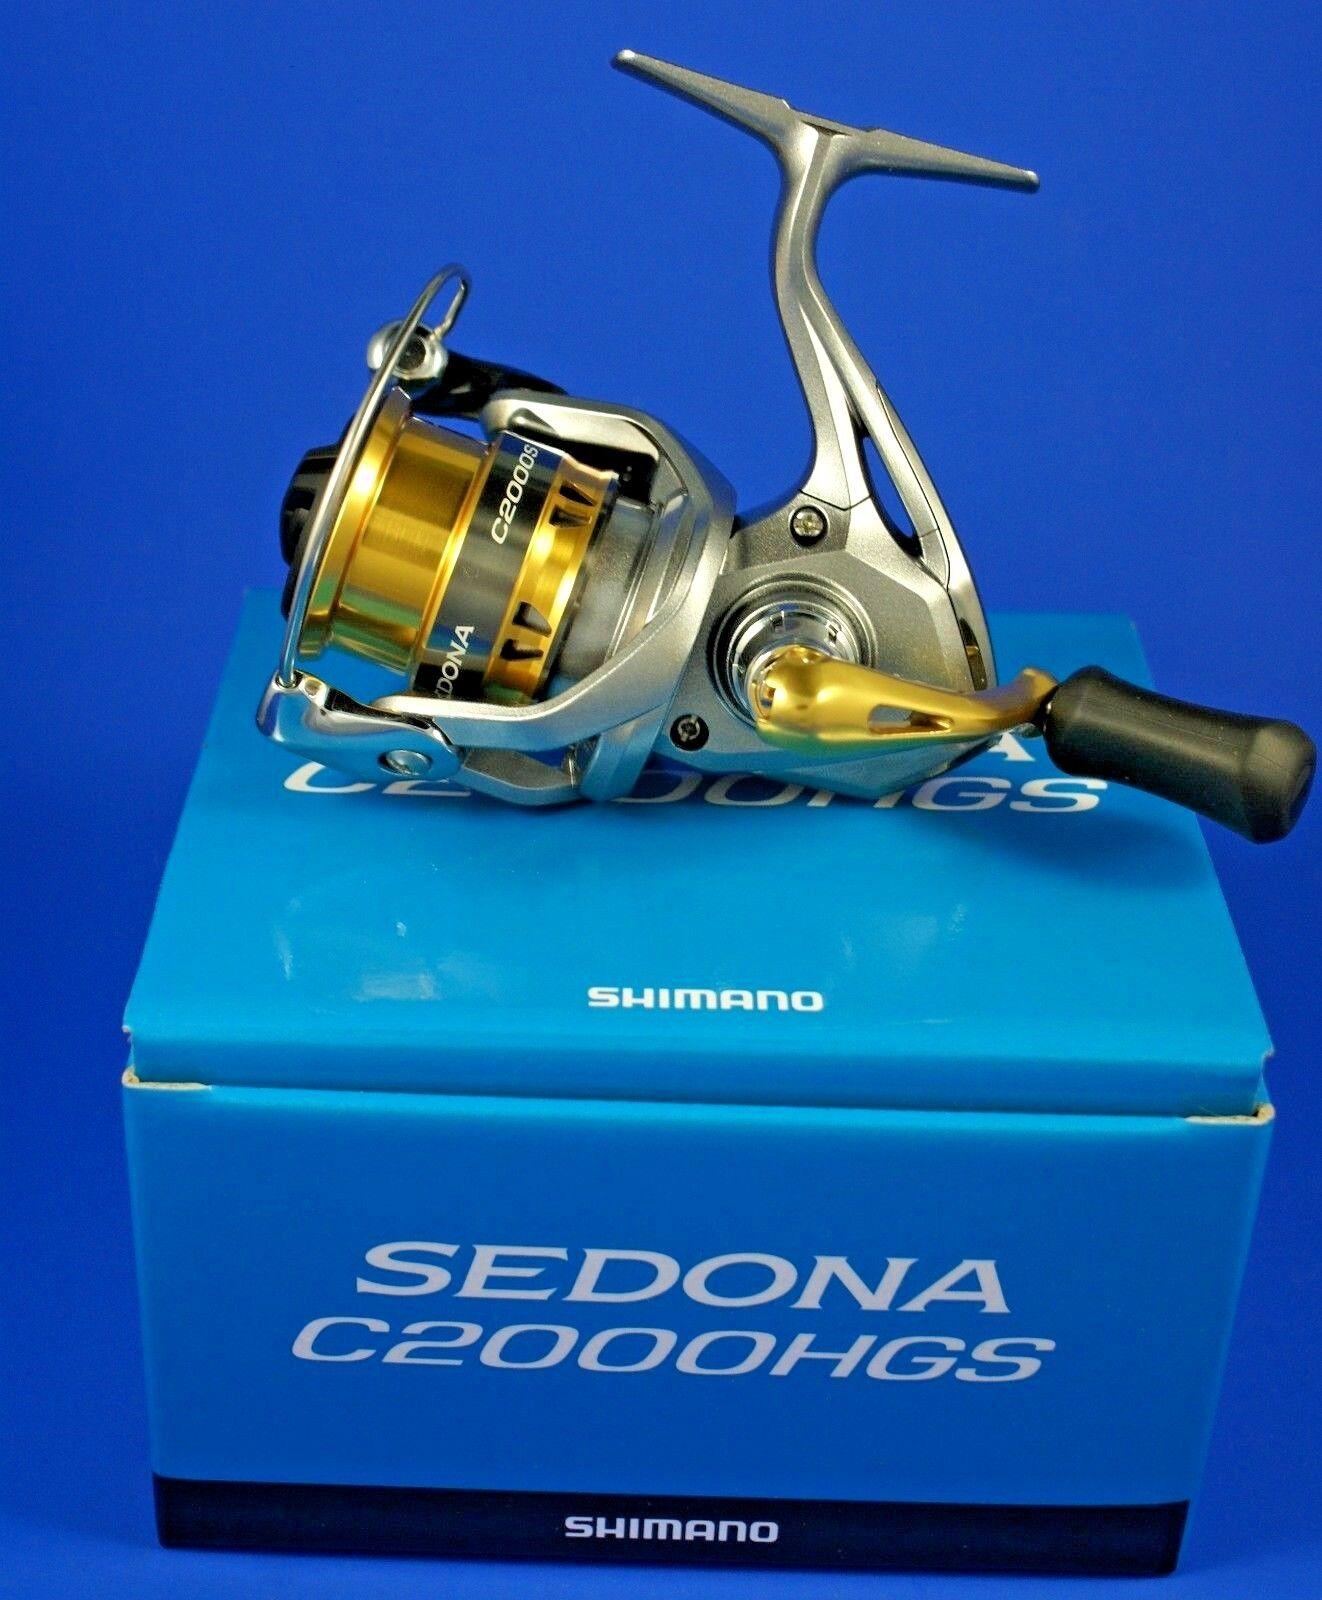 Shimano Sedona C2000HGS FI    SEC2000HGSFI     Front Drag Fishing Reel  new products novelty items